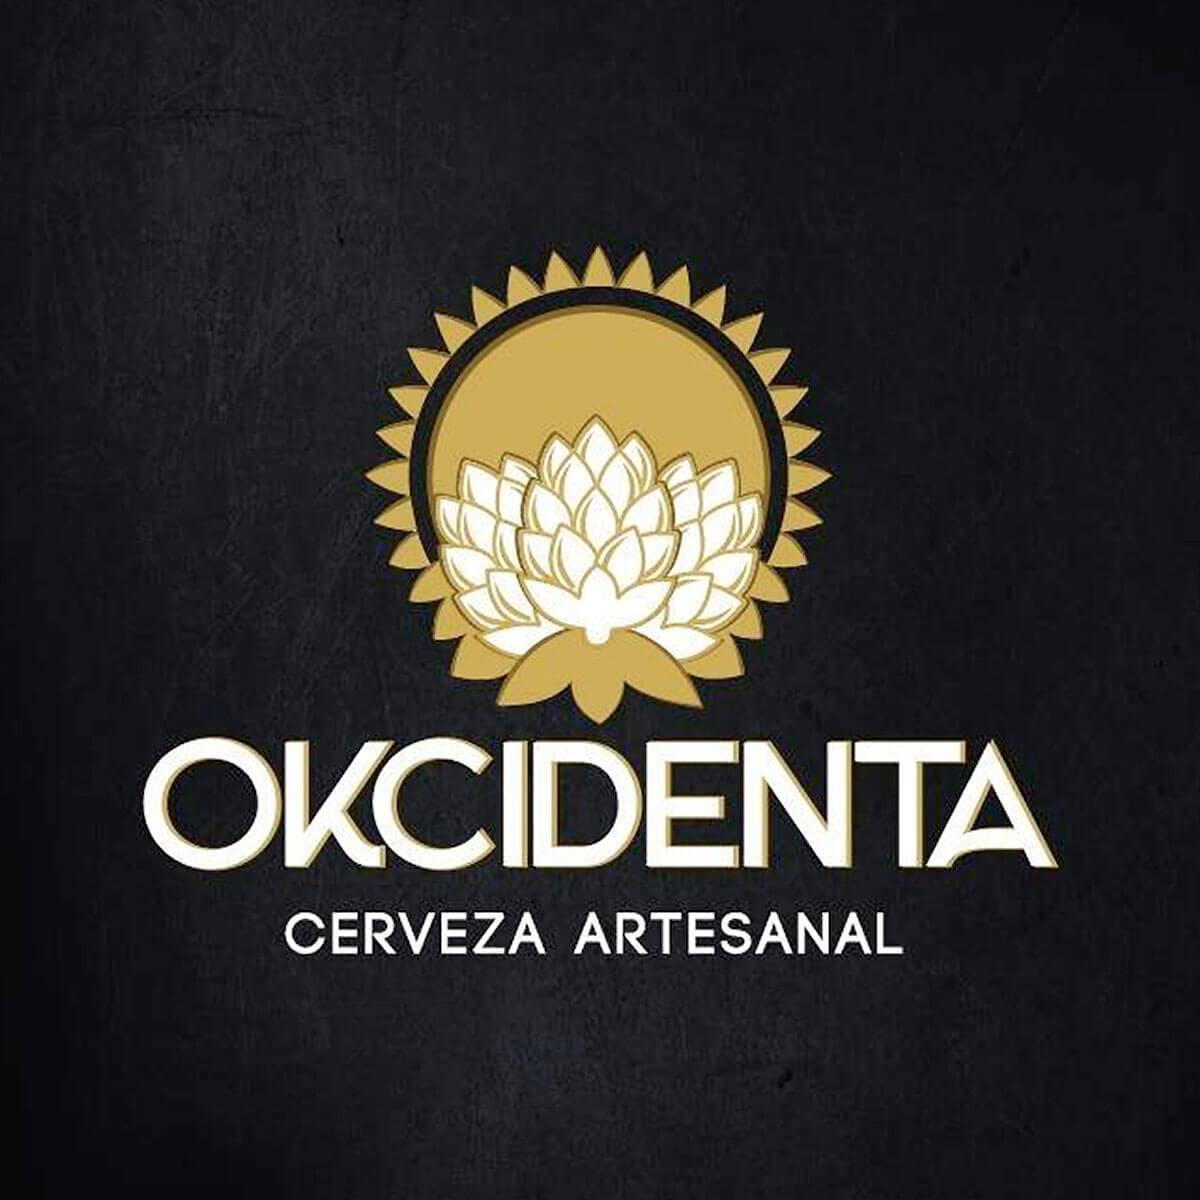 Cerveza Artesanal Okcidenta Logo